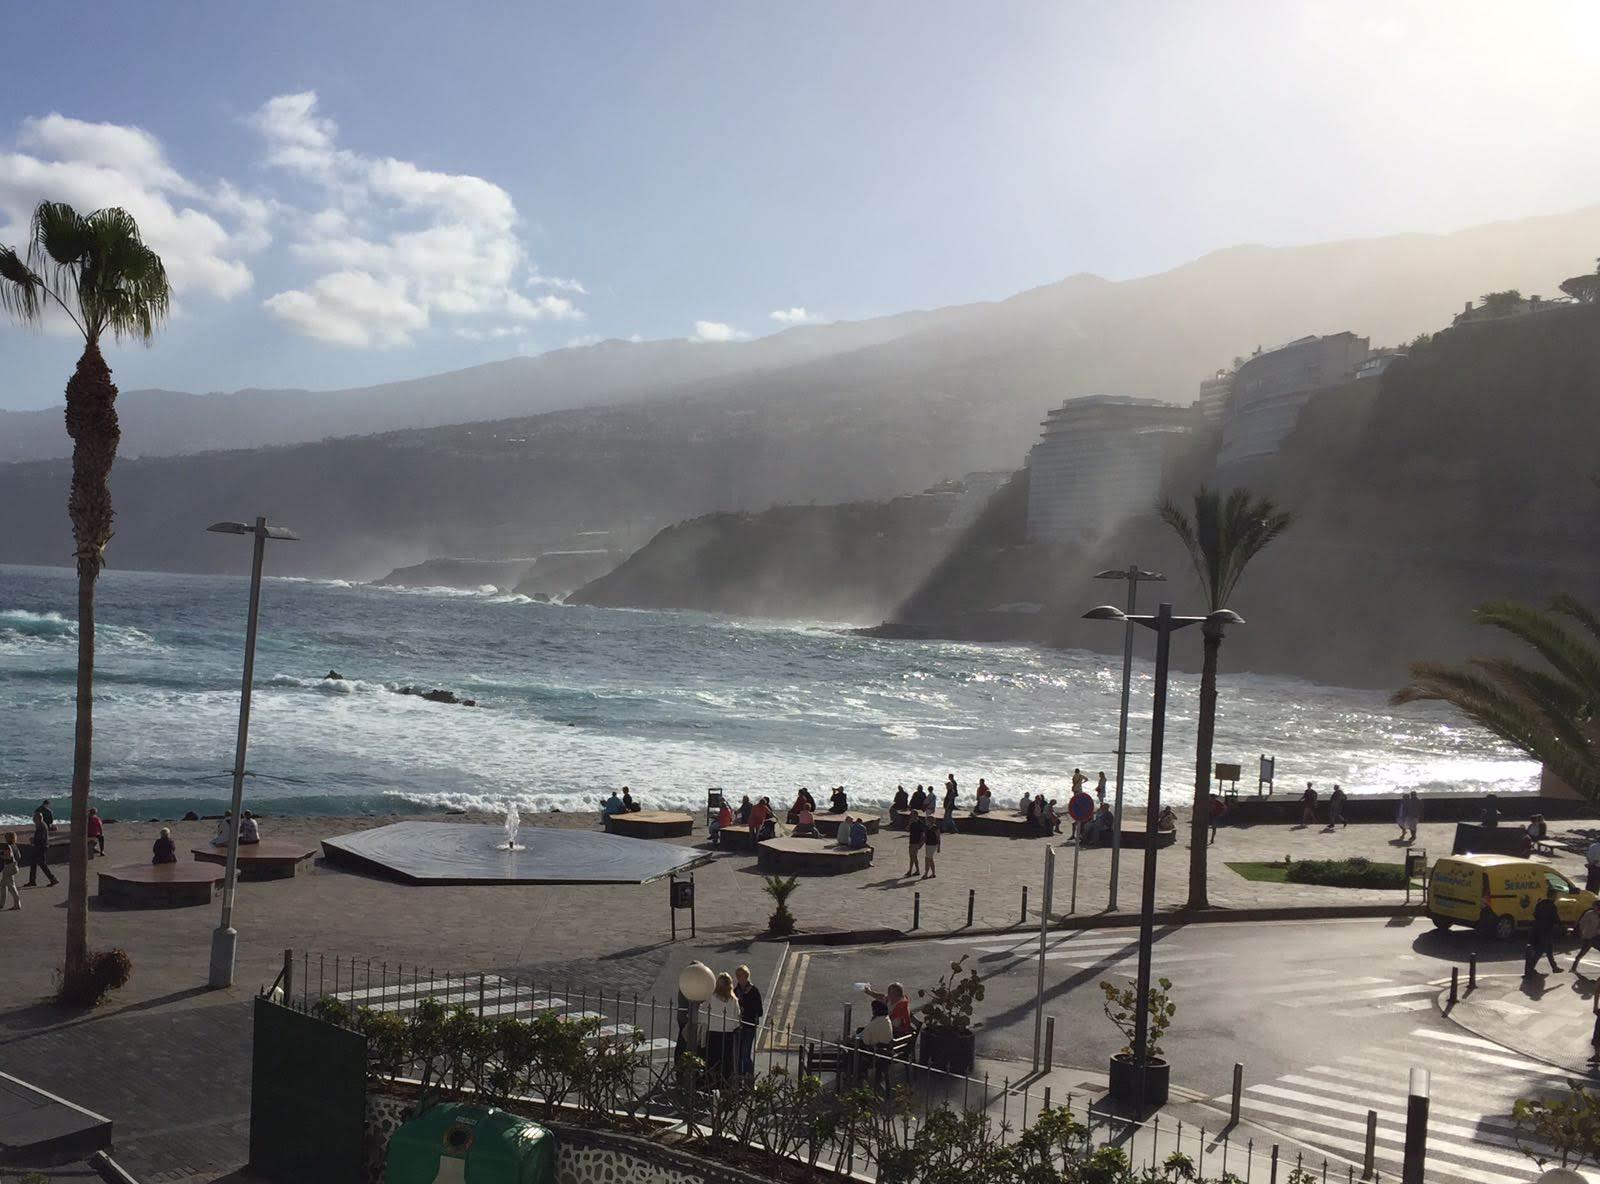 Waves hitting the coastline of northern Tenerife